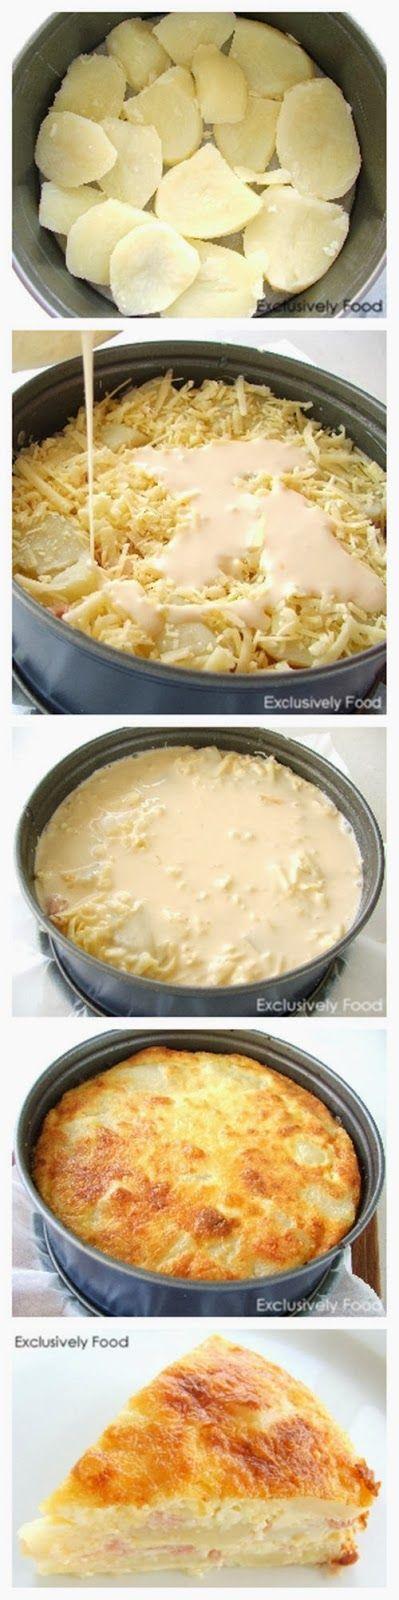 Aardappel/kaas/ham taart